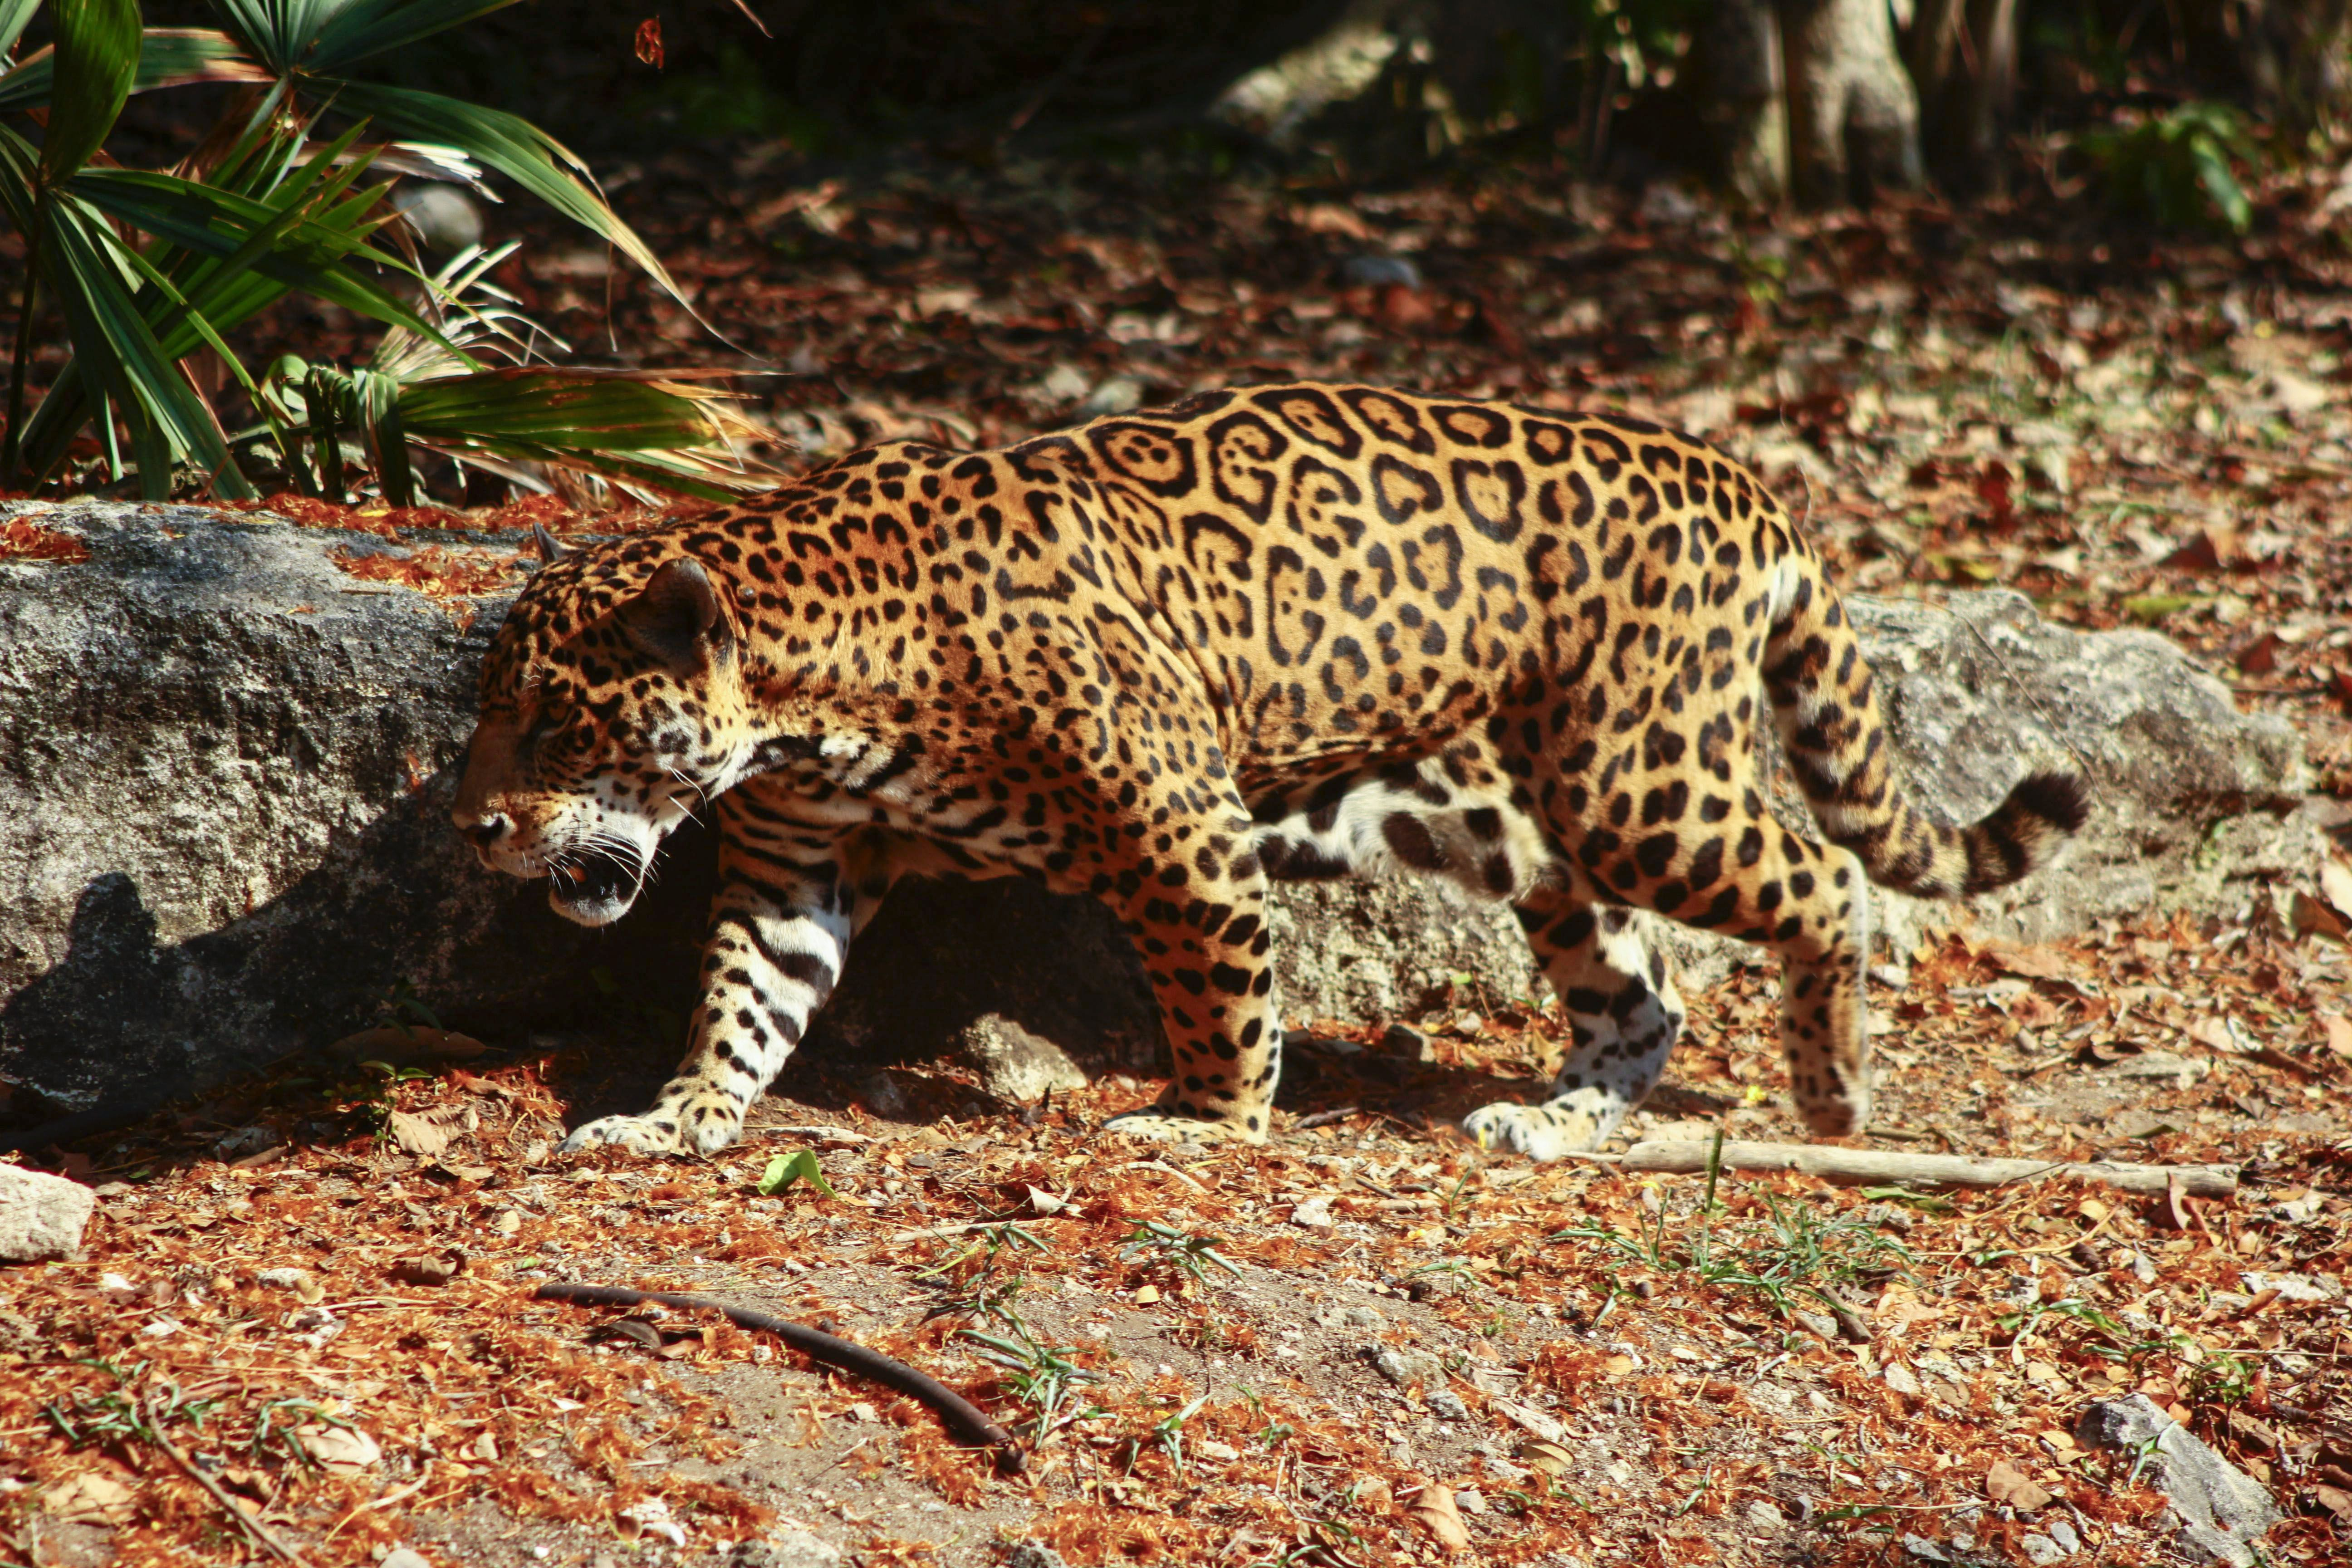 A jaguar in the pantanal wetlands